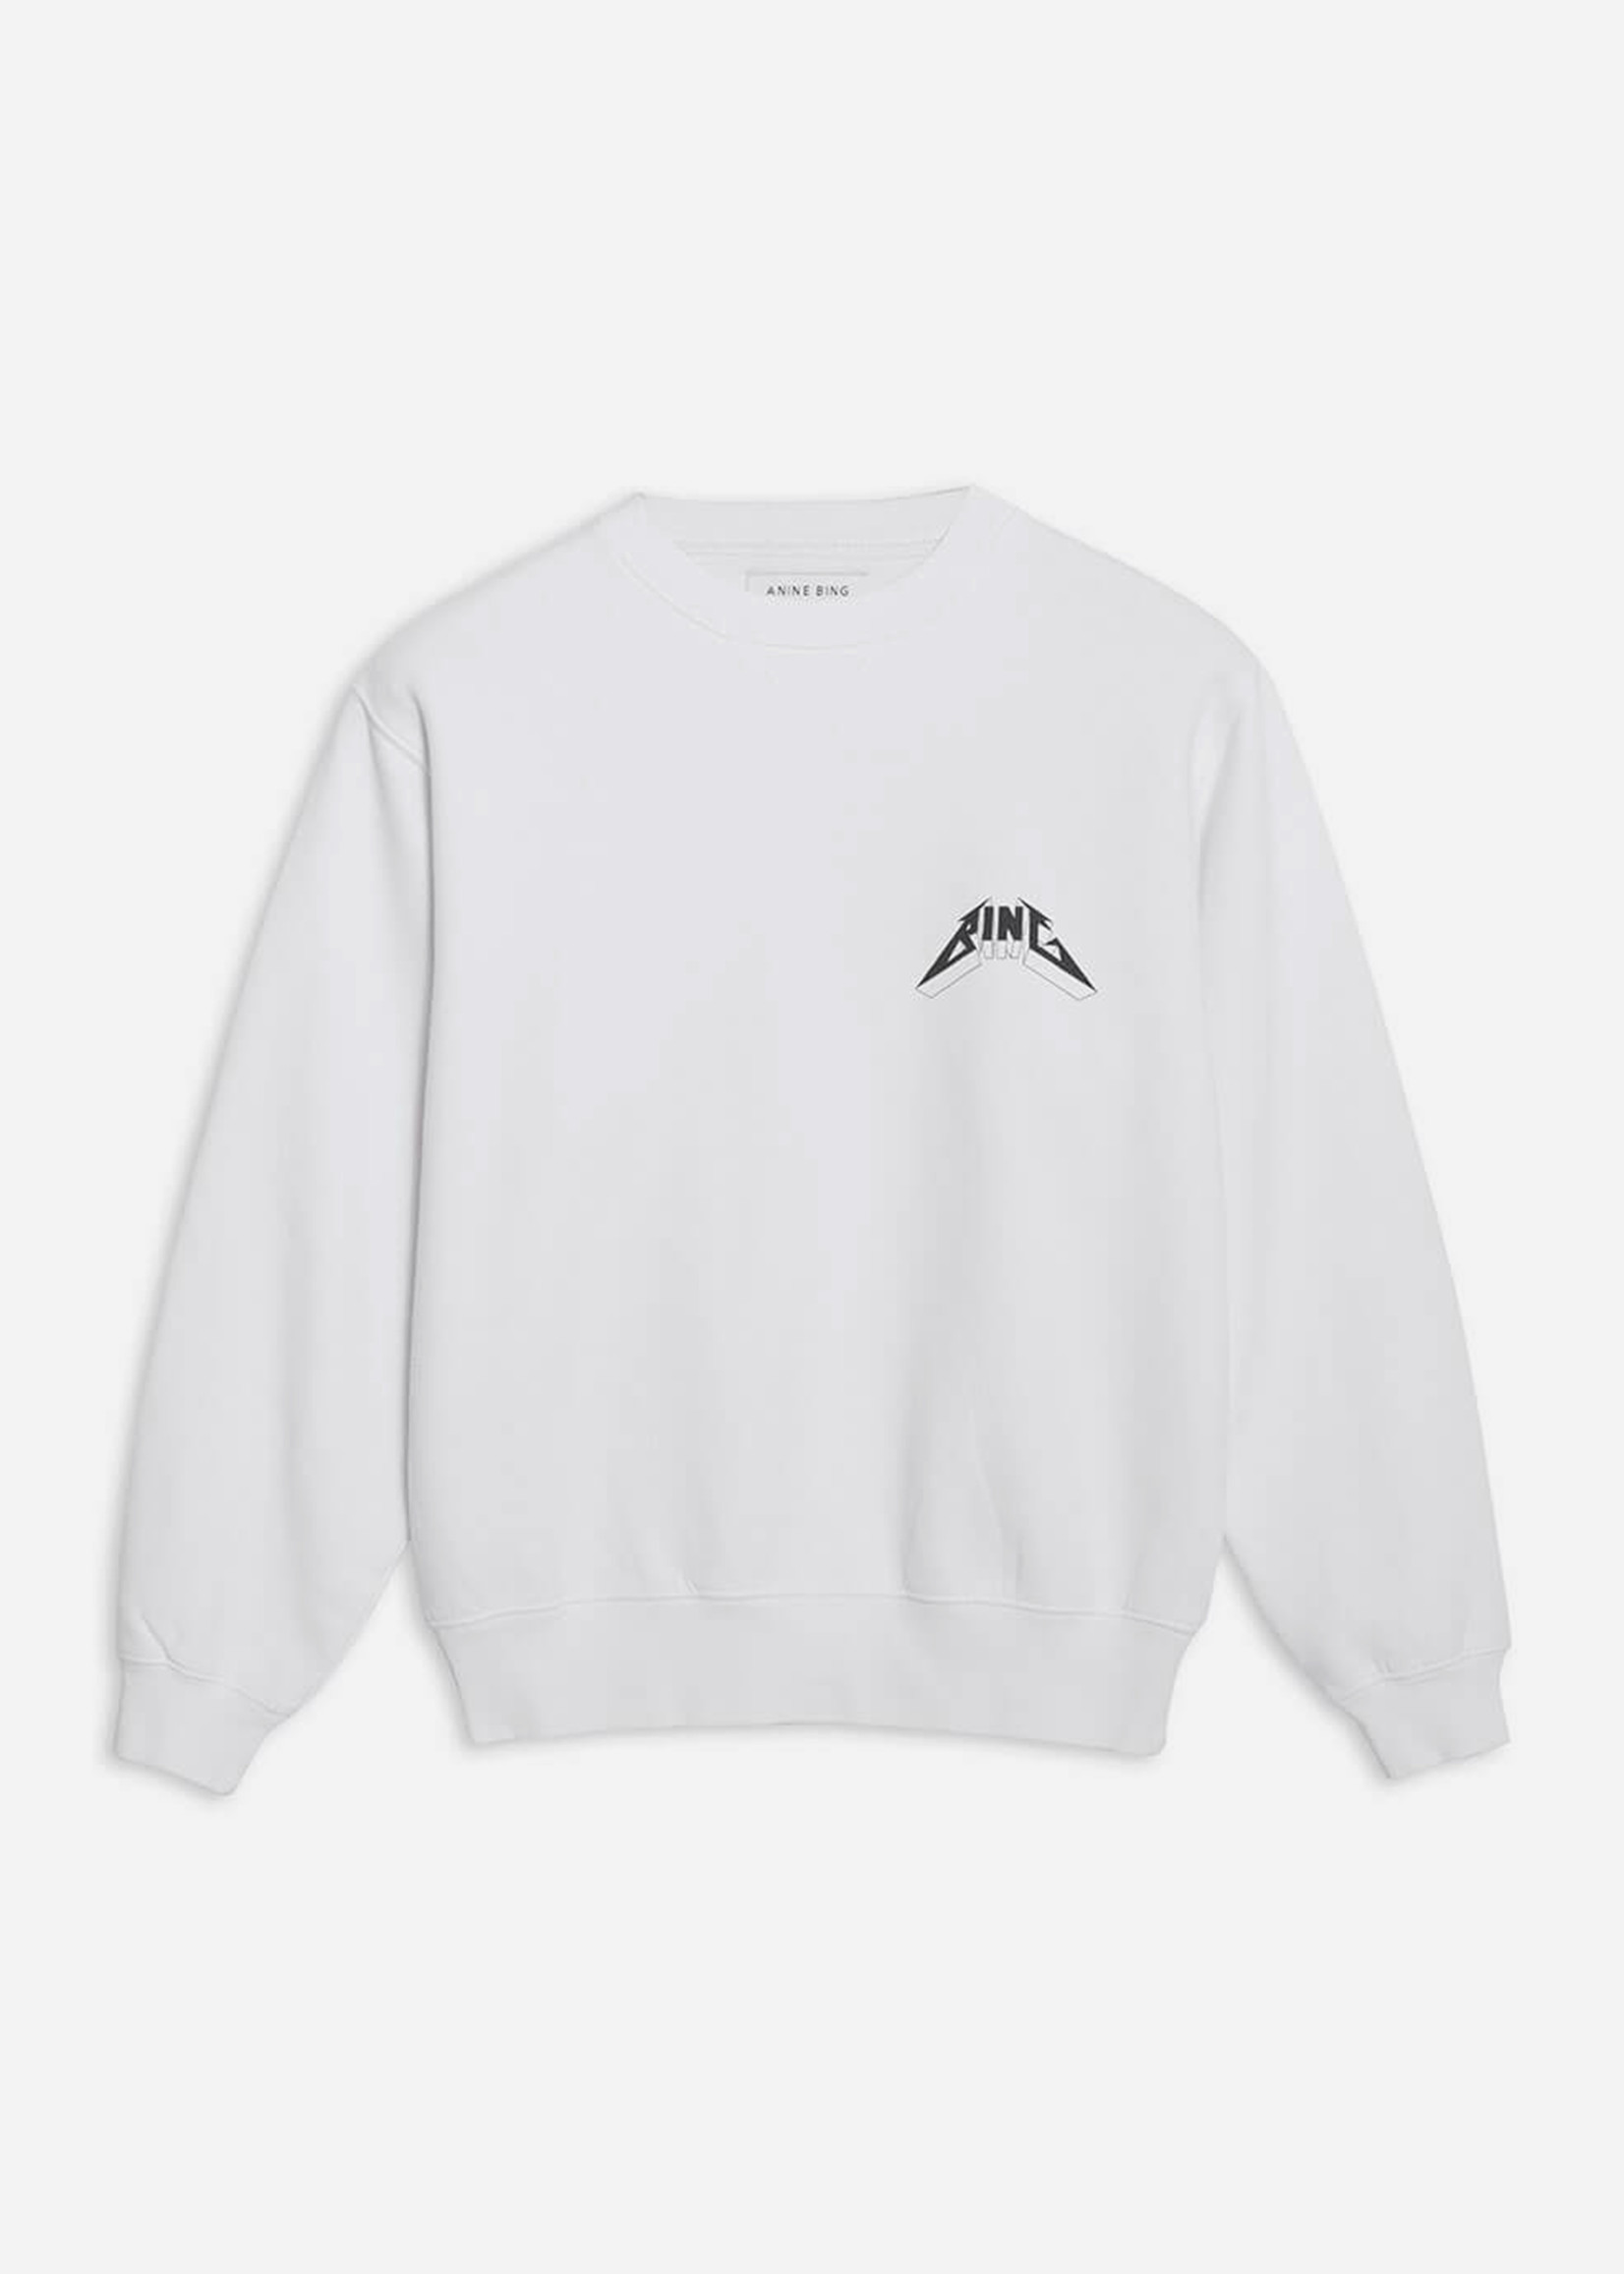 Anine Bing Ramona Sweatshirt Tour White